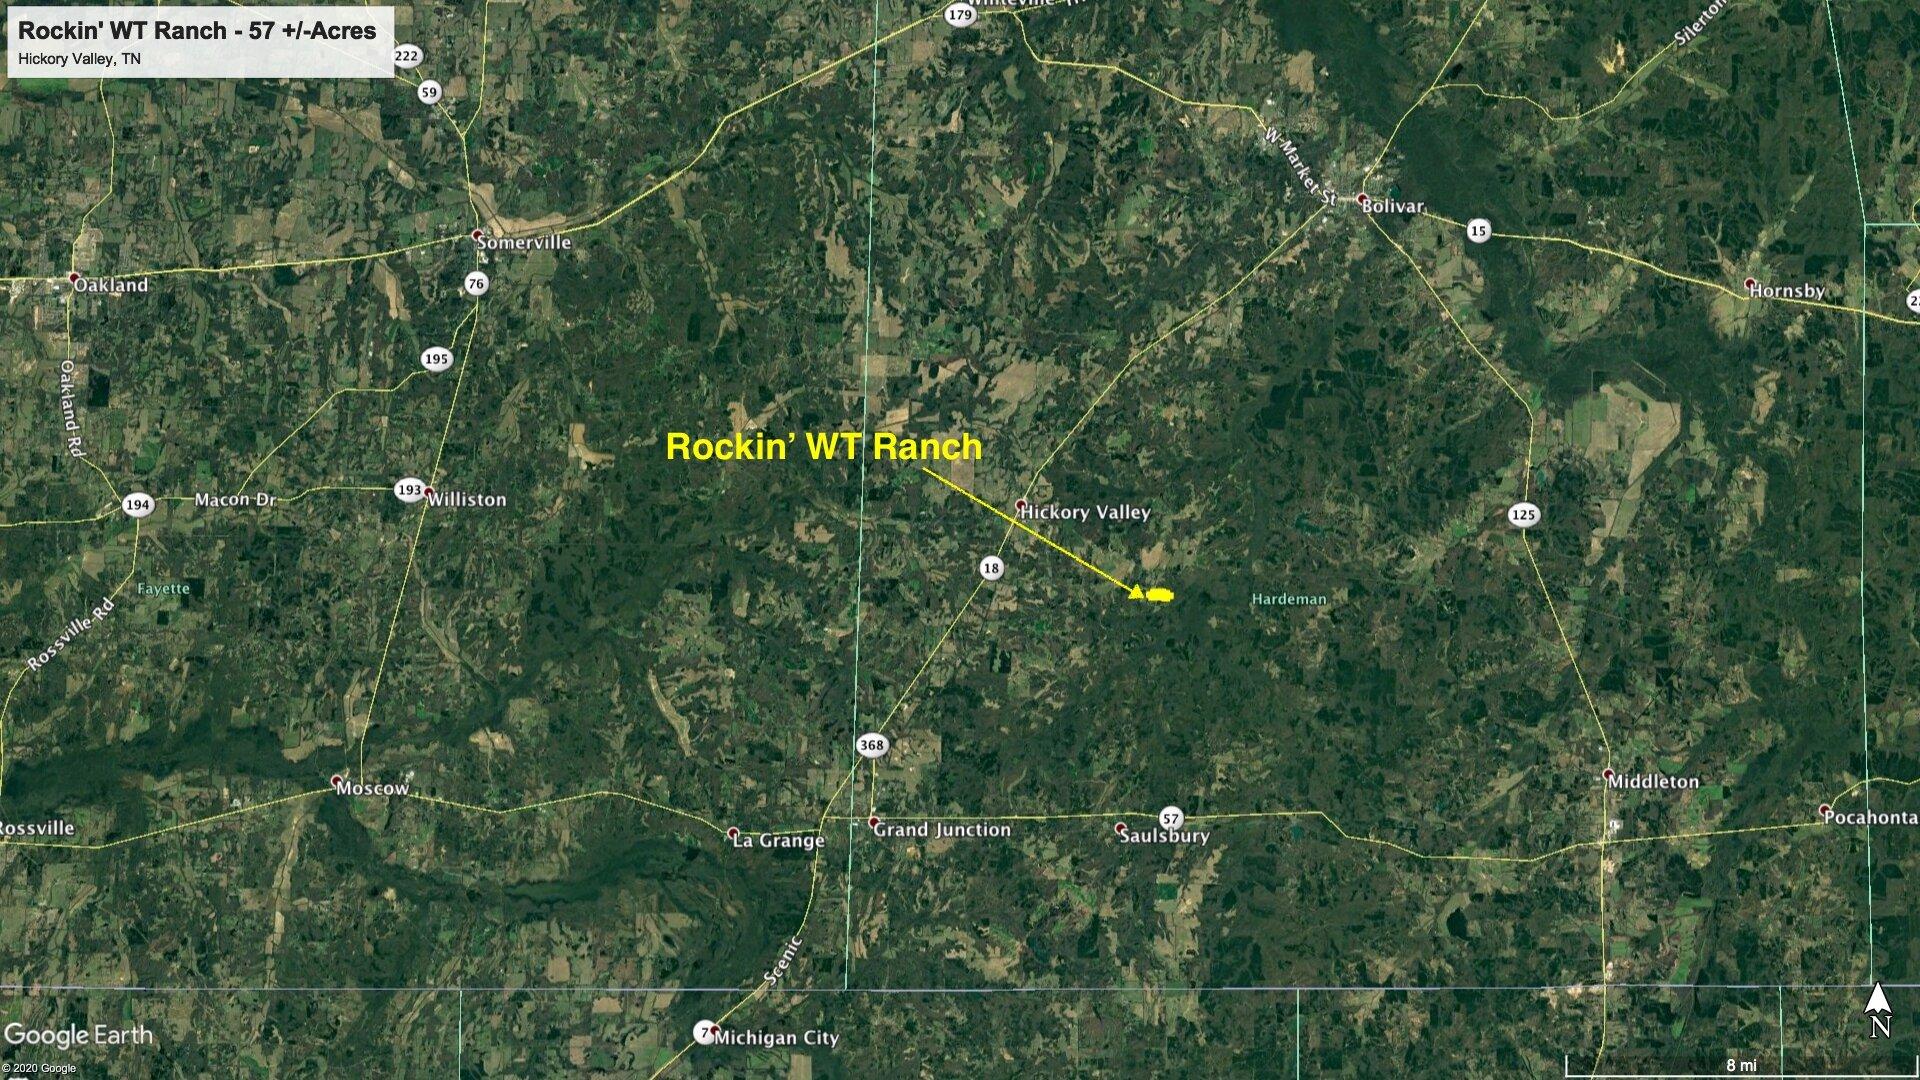 Rockin' WT Ranch - 57+:- Acres -Wide View.jpg